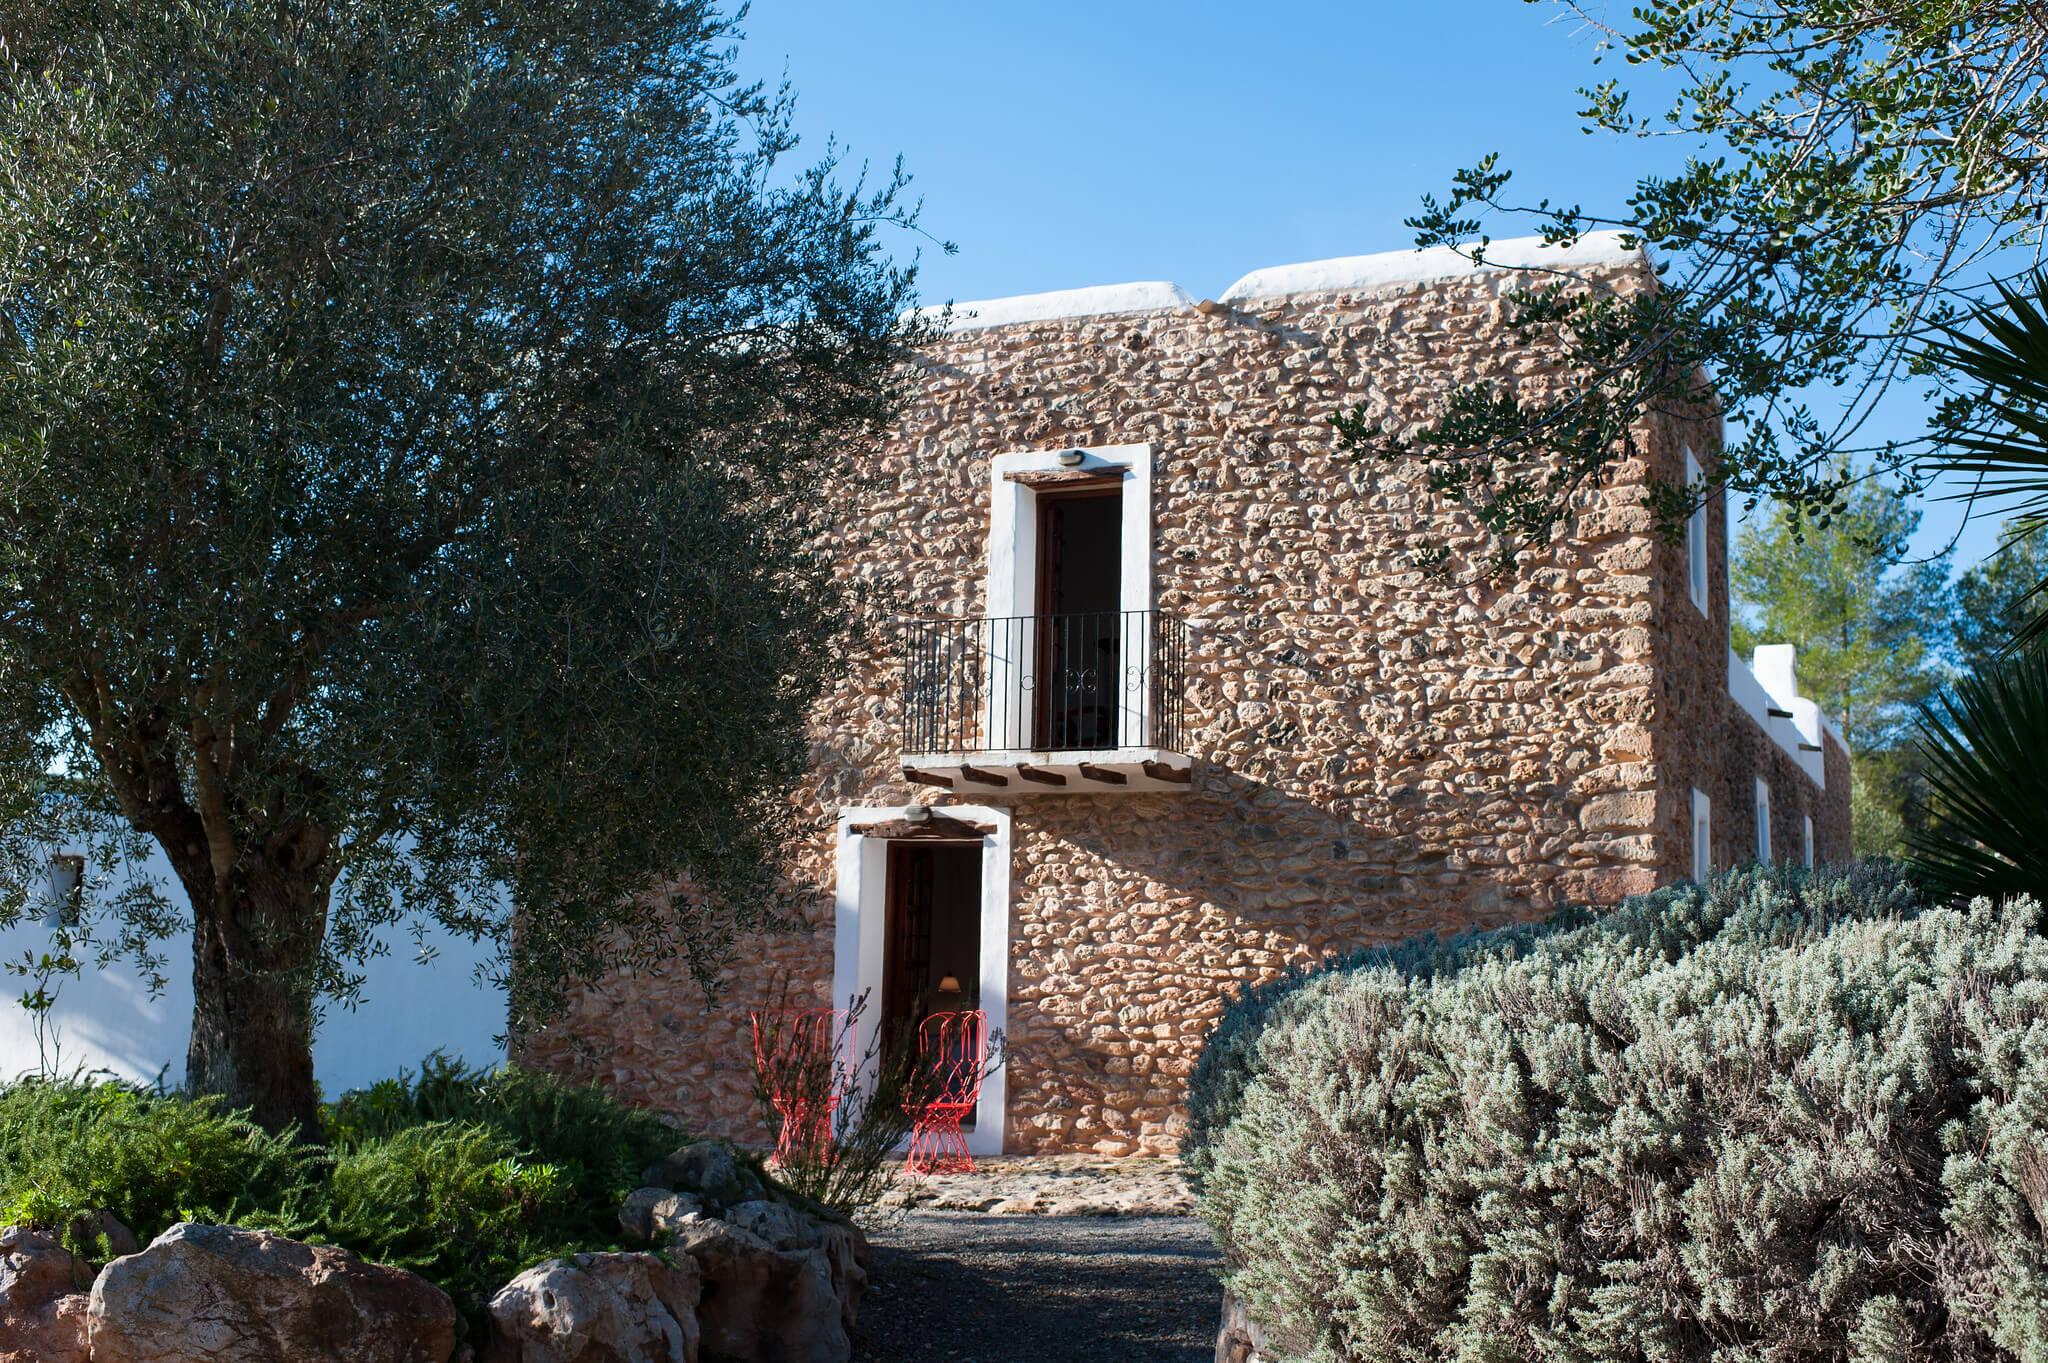 https://www.white-ibiza.com/wp-content/uploads/2020/05/white-ibiza-villas-canblay-casita.jpg